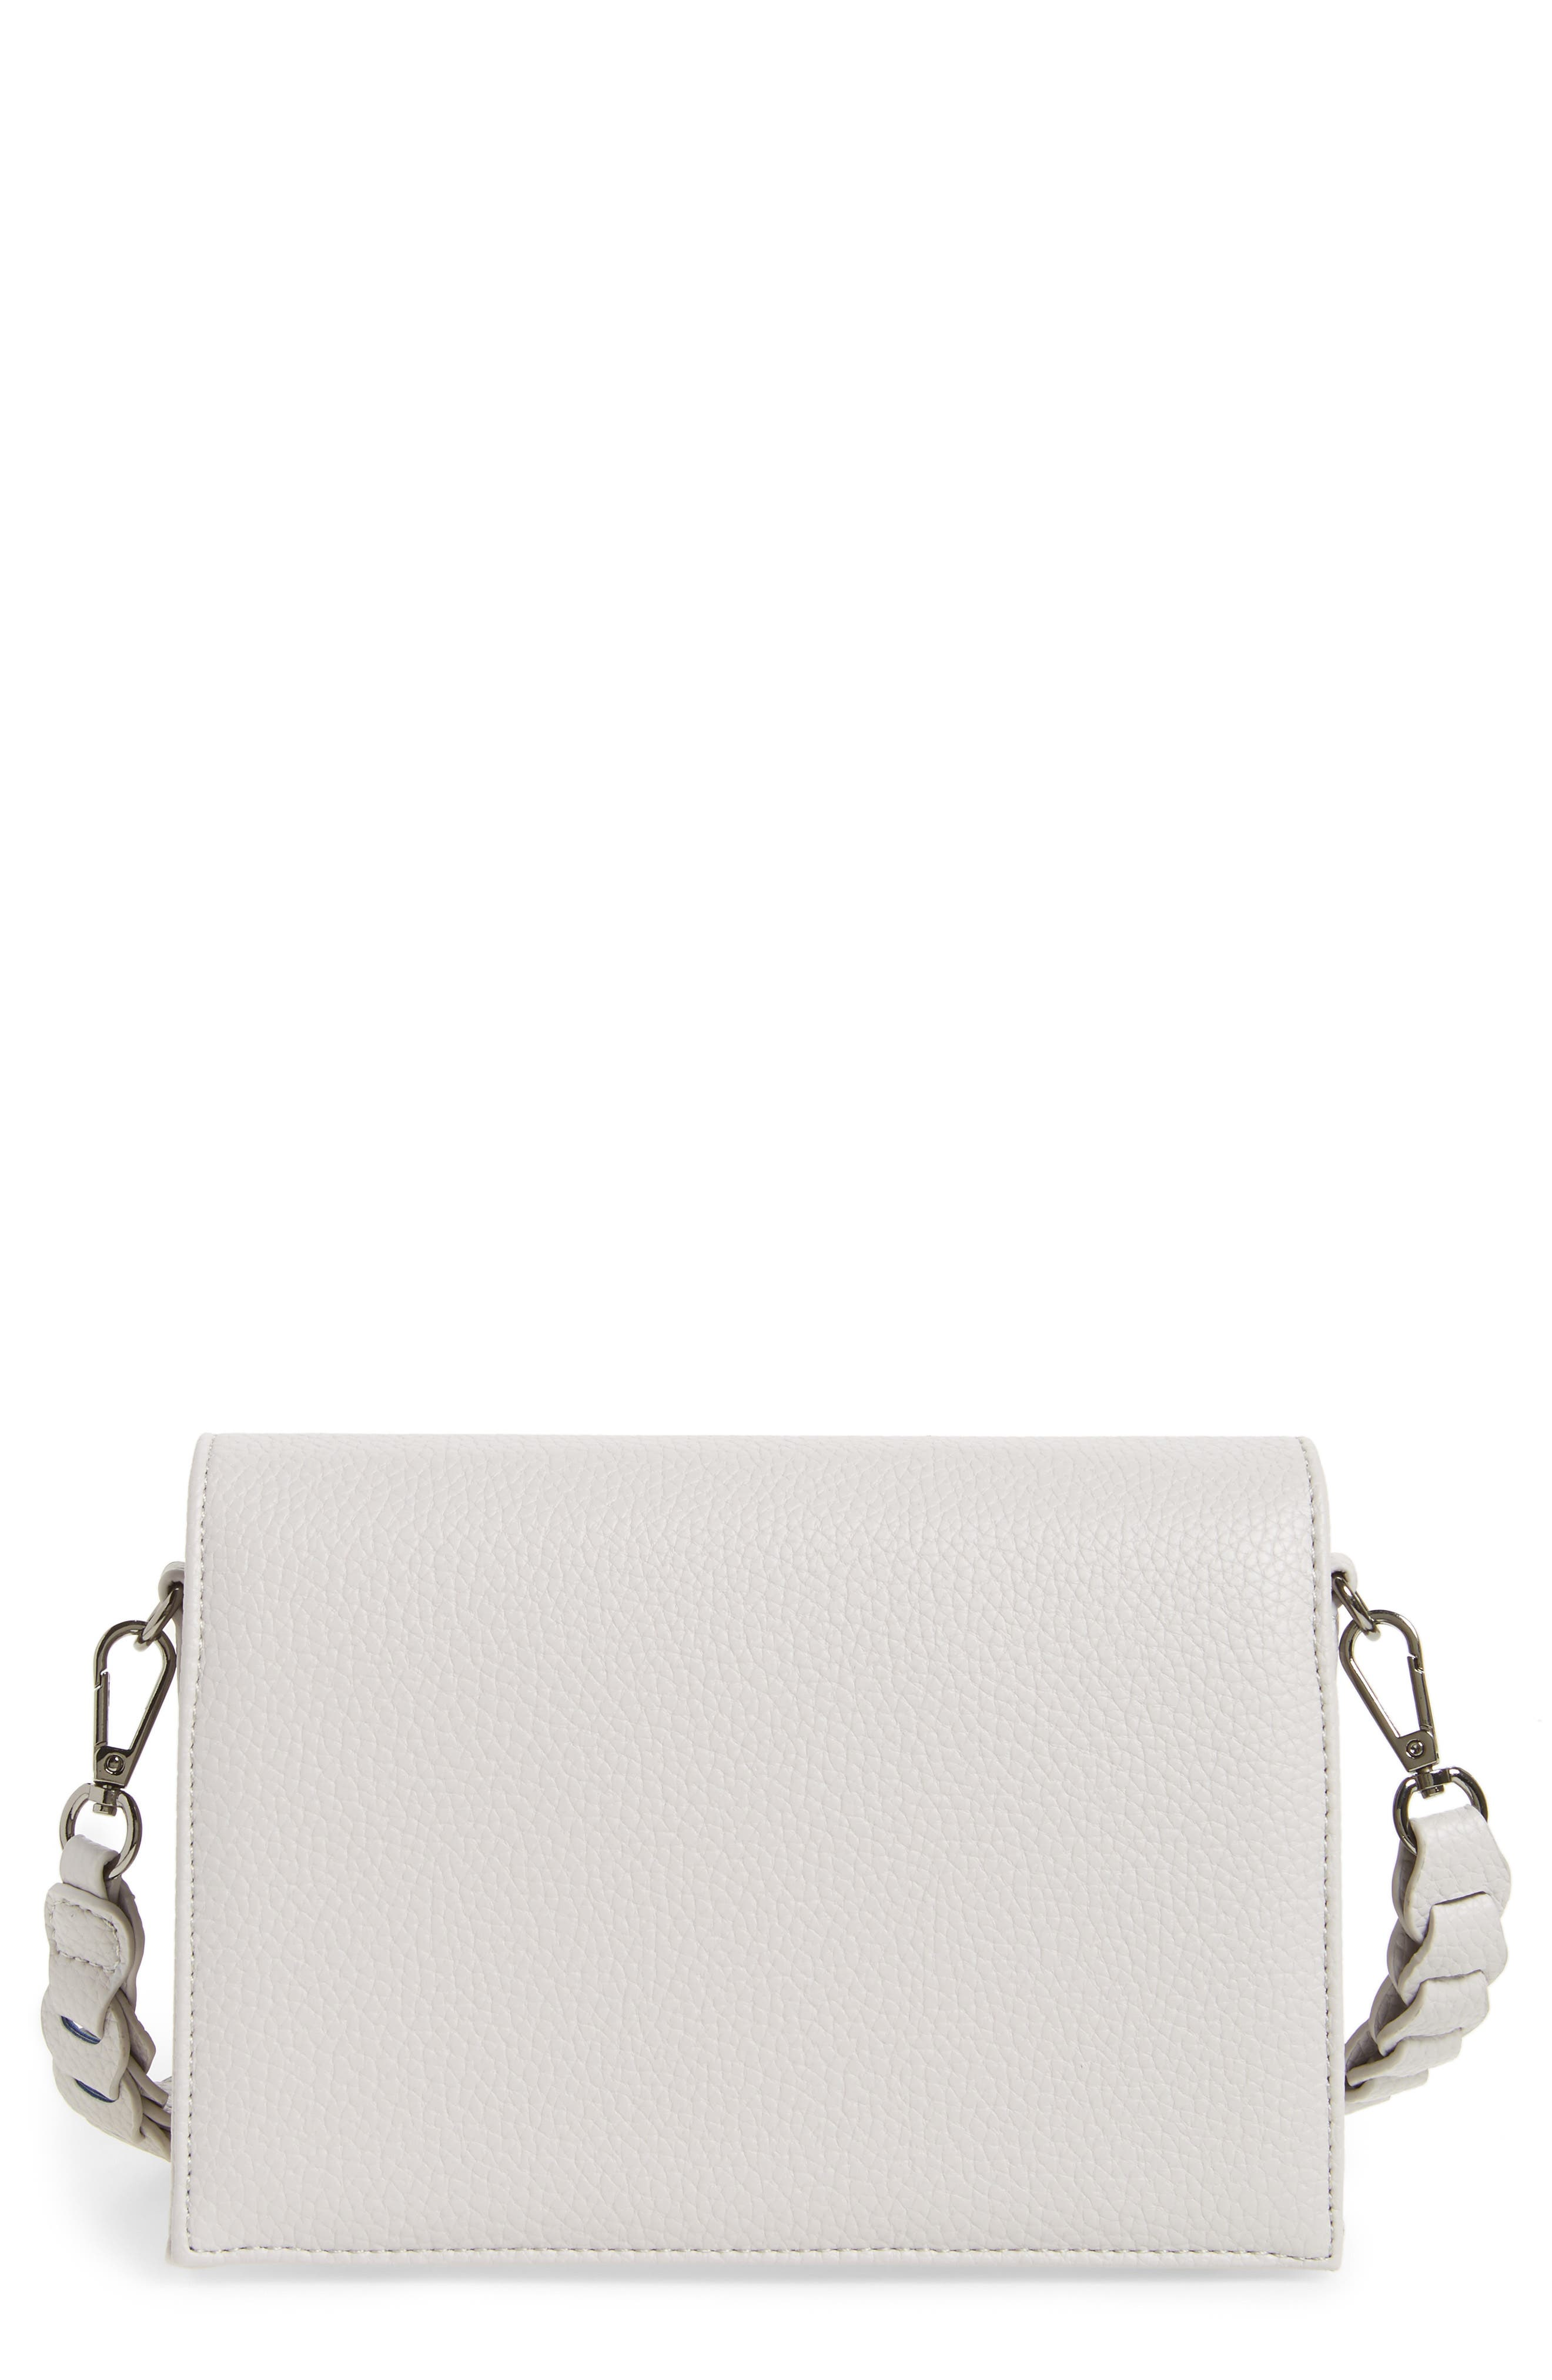 Braided Handle Crossbody Bag,                             Main thumbnail 1, color,                             020